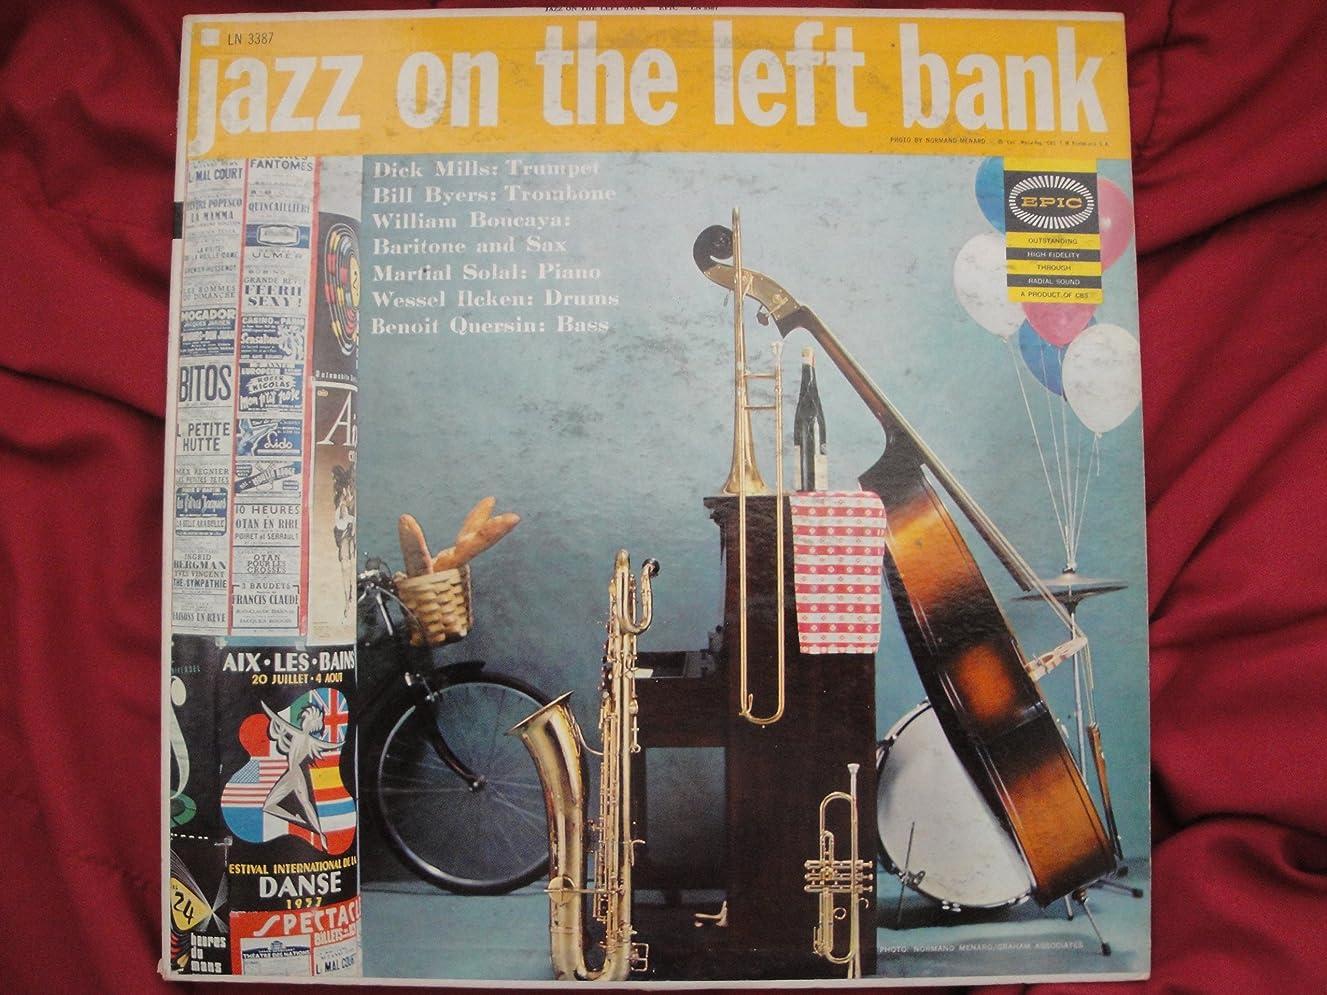 Jazz On The Left Bank, EPIC LN-3387, Dick Mills, Bill Byers, William Boueaya, Matial Solal, Wessel Ilcken, Benoit Quersin, Vinyl Lp Record Vg+